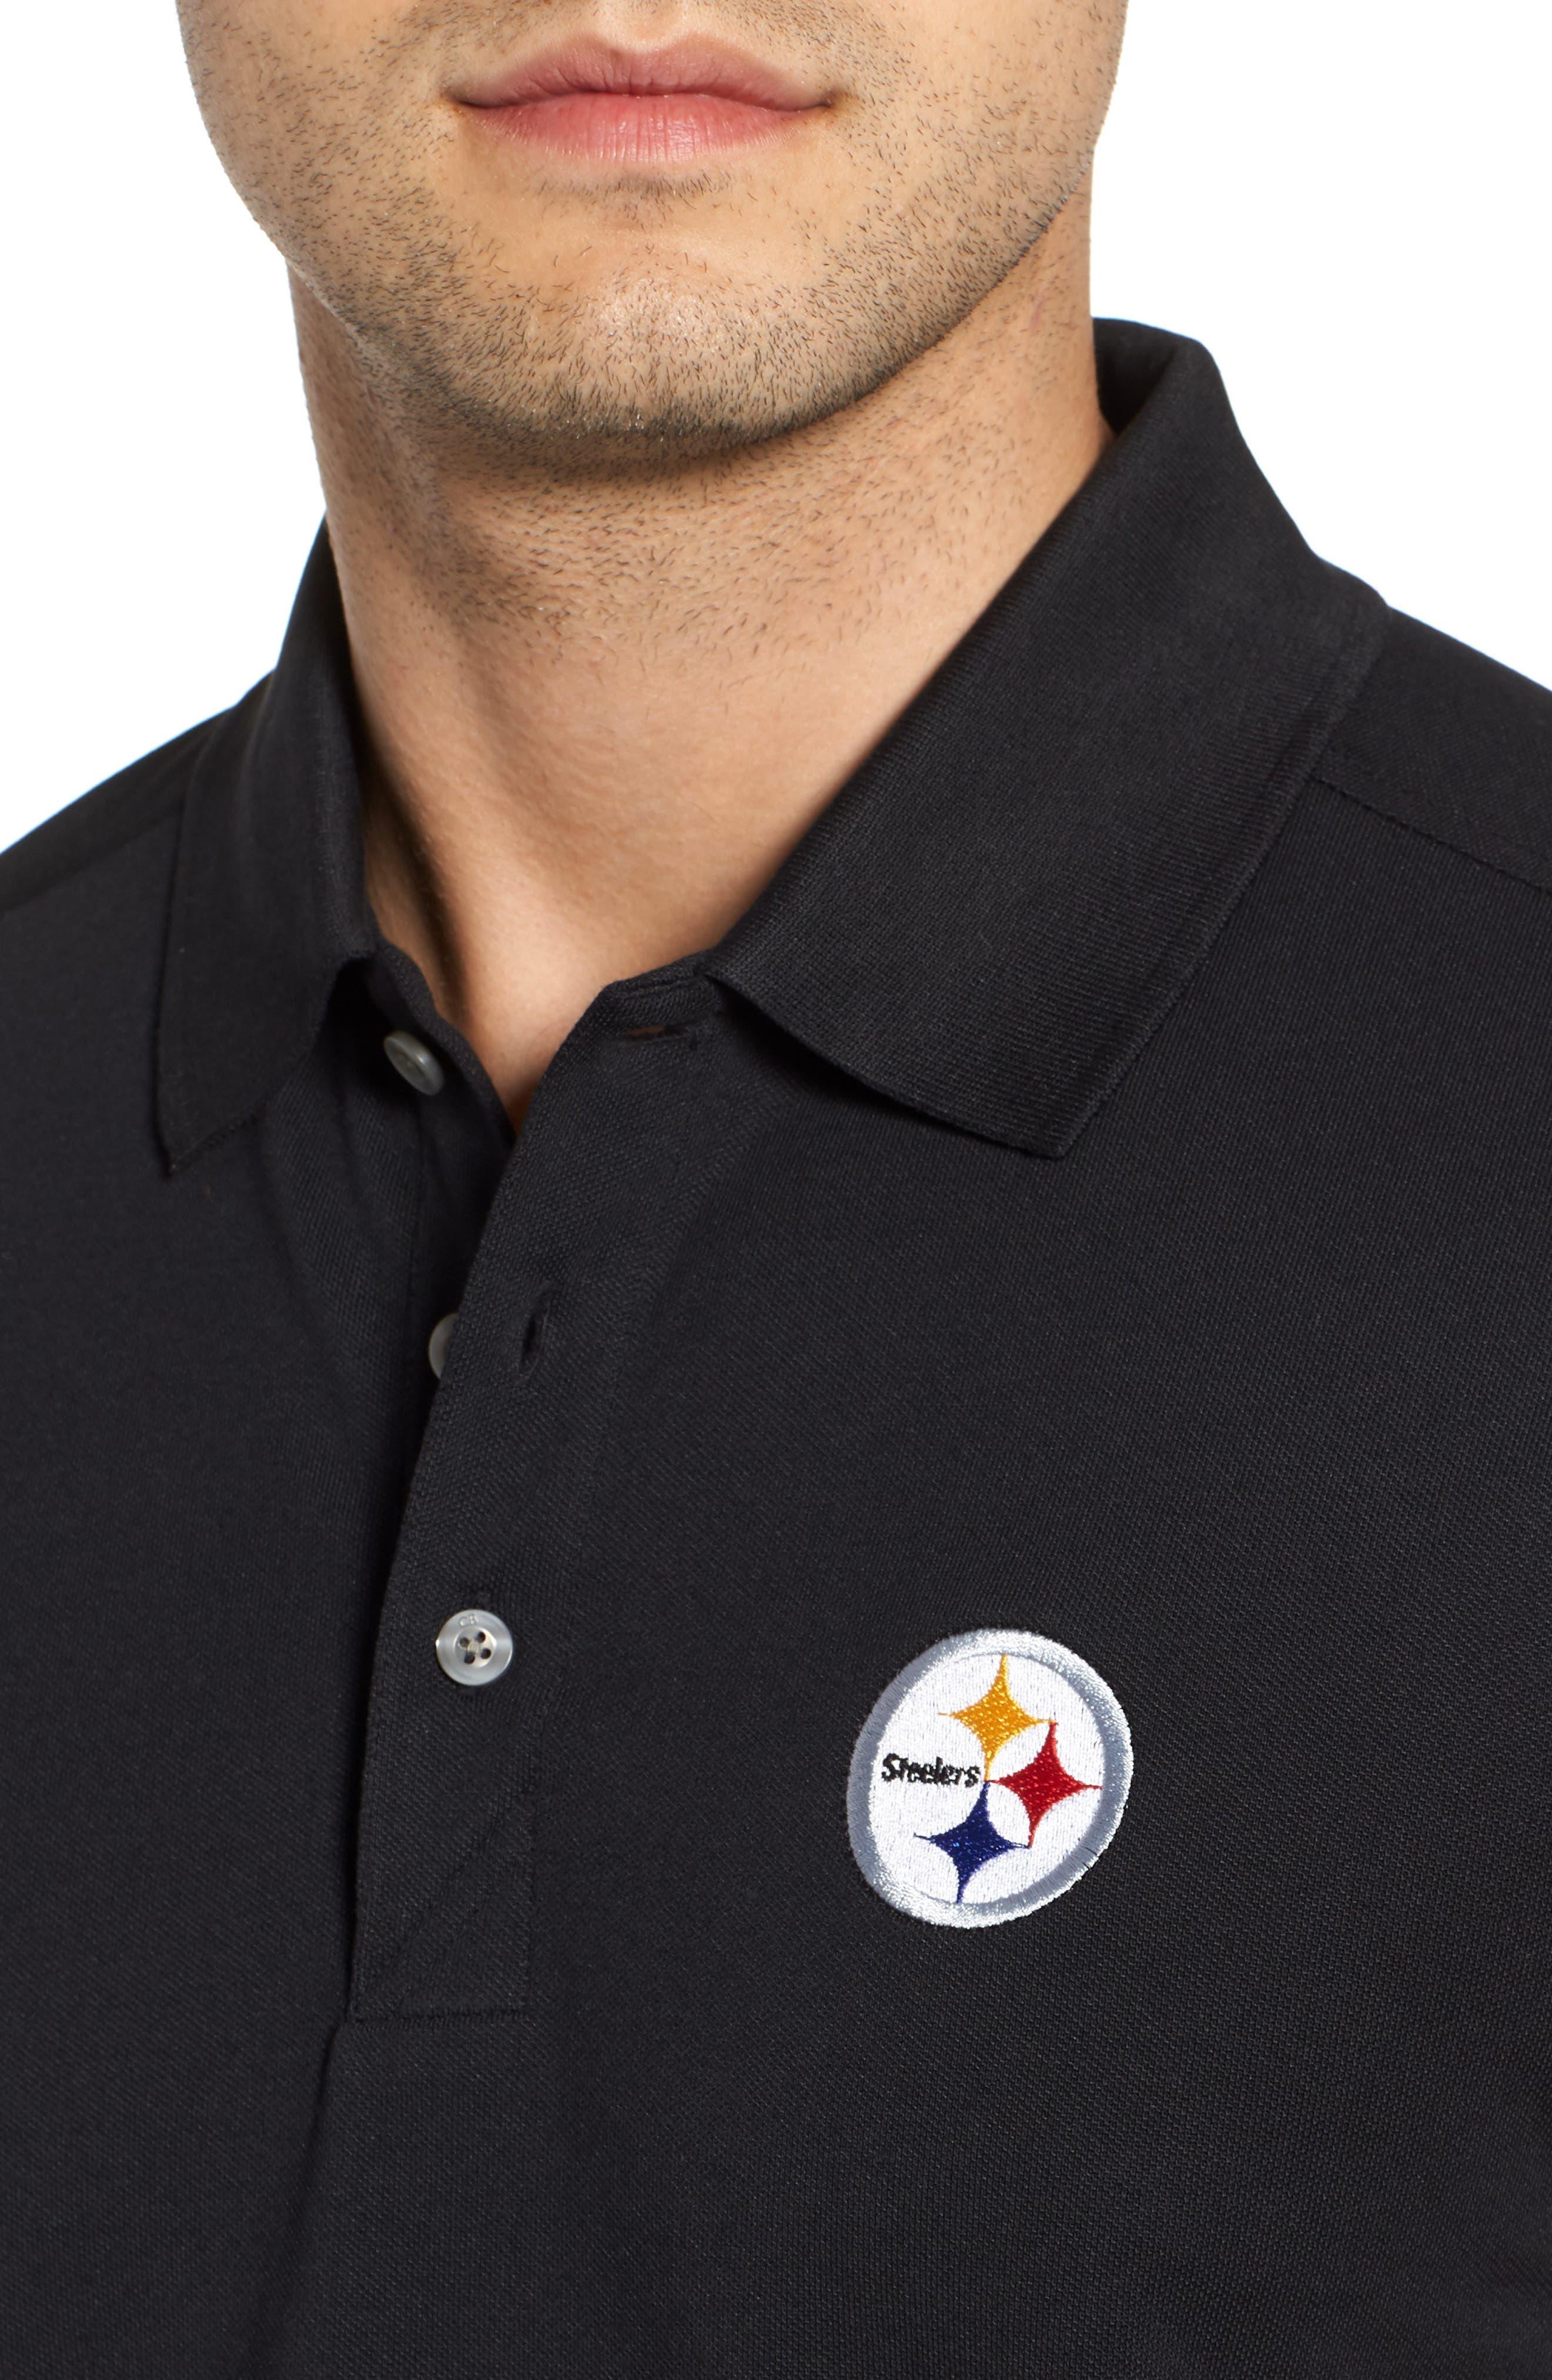 Pittsburgh Steelers - Advantage Regular Fit DryTec Polo,                             Alternate thumbnail 4, color,                             001